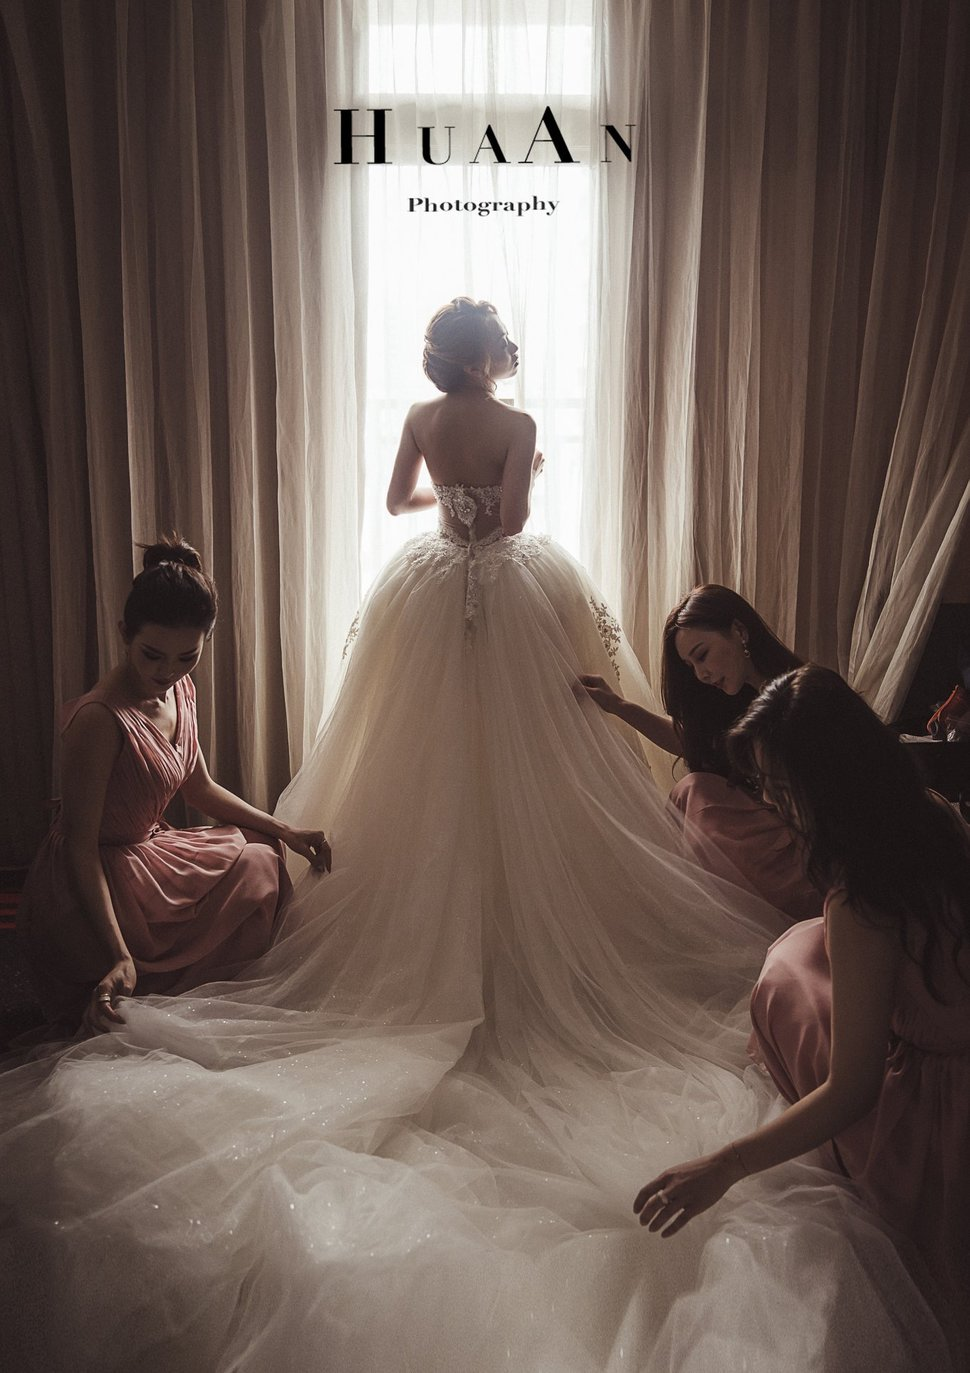 3C273387-6C77-4431-8966-885D6D1354DF - Huaan Photography《結婚吧》